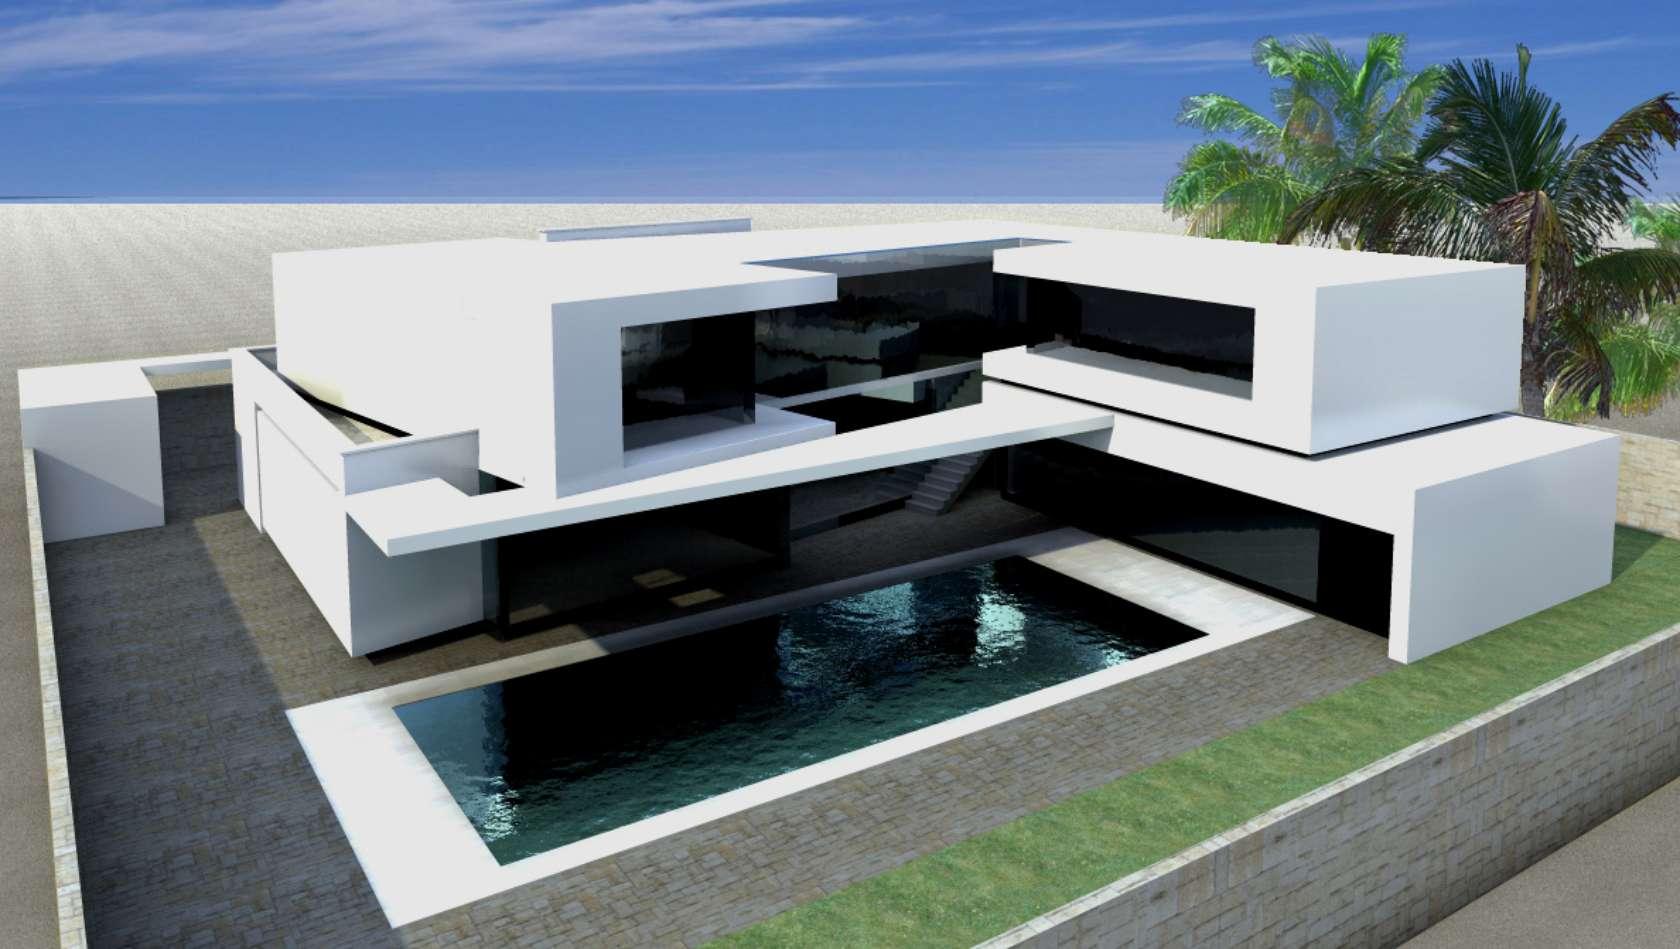 Claudio catalano architecture design architizer for Modern house qatar